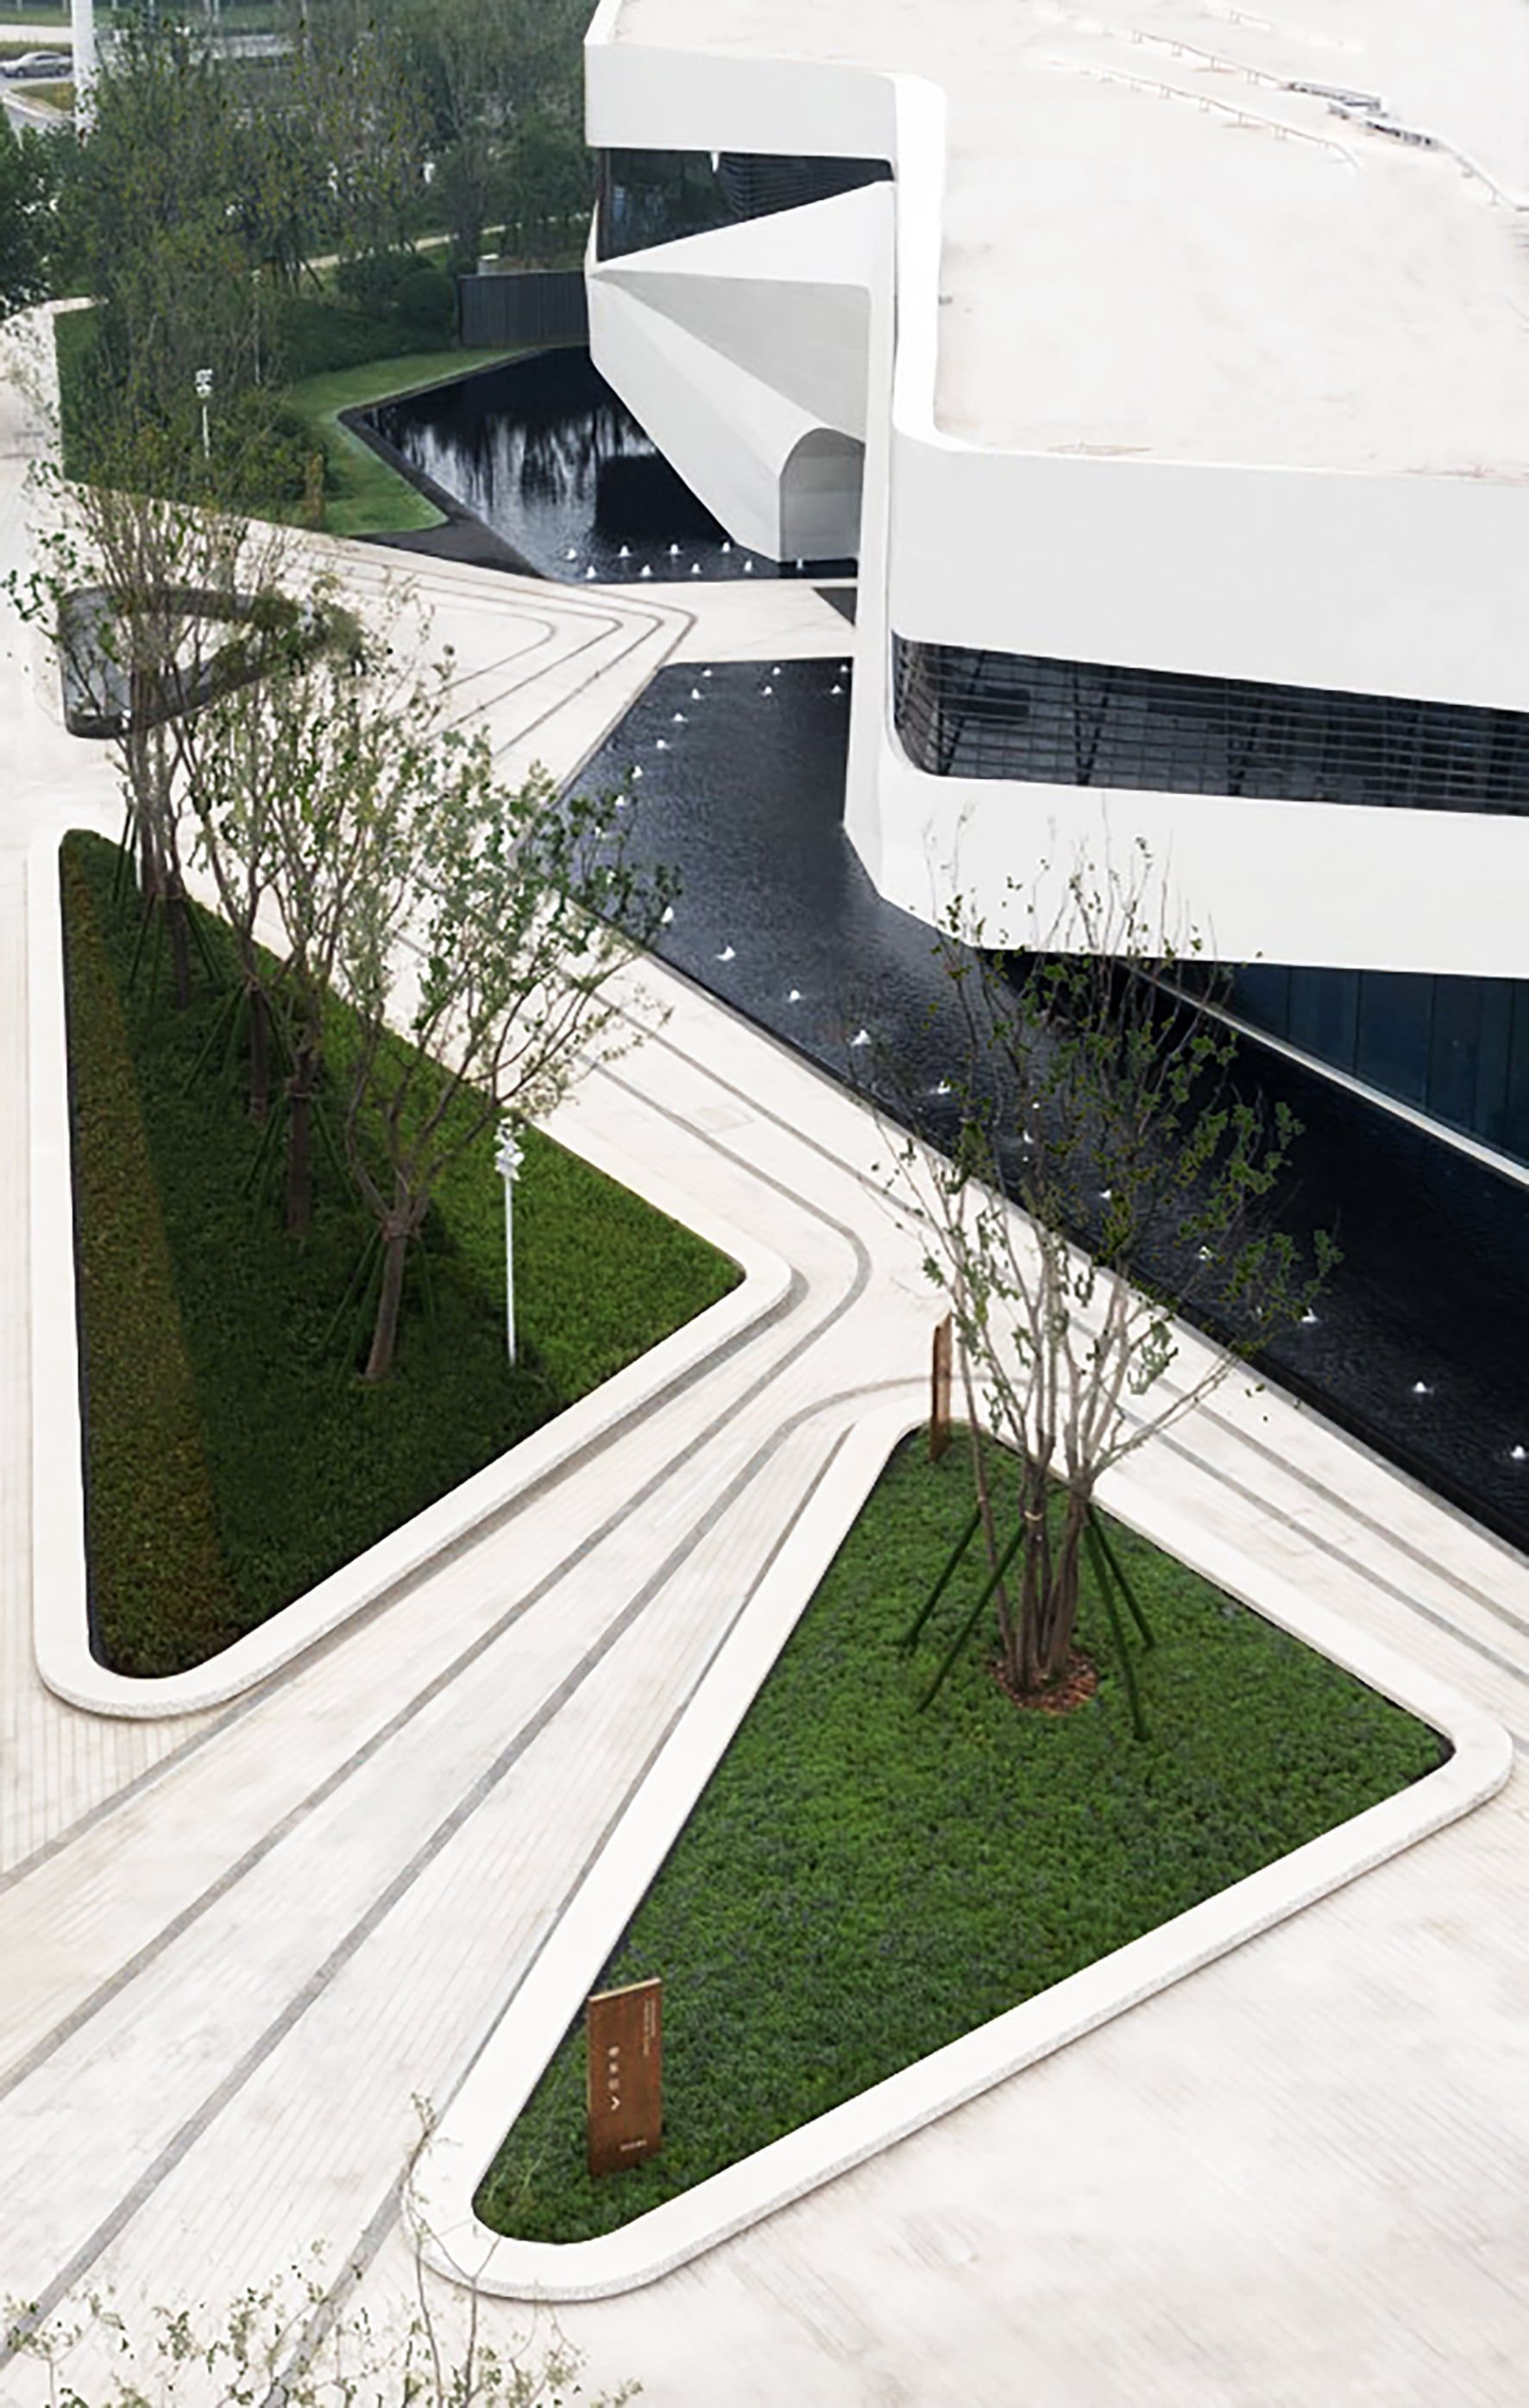 Zhengzhou Longhu Financial Island City Showroom Z Scape 致 舍 电影 Urbandesignarchitect In 2020 Urban Design Architecture Landscape Architecture Architecture Courtyard